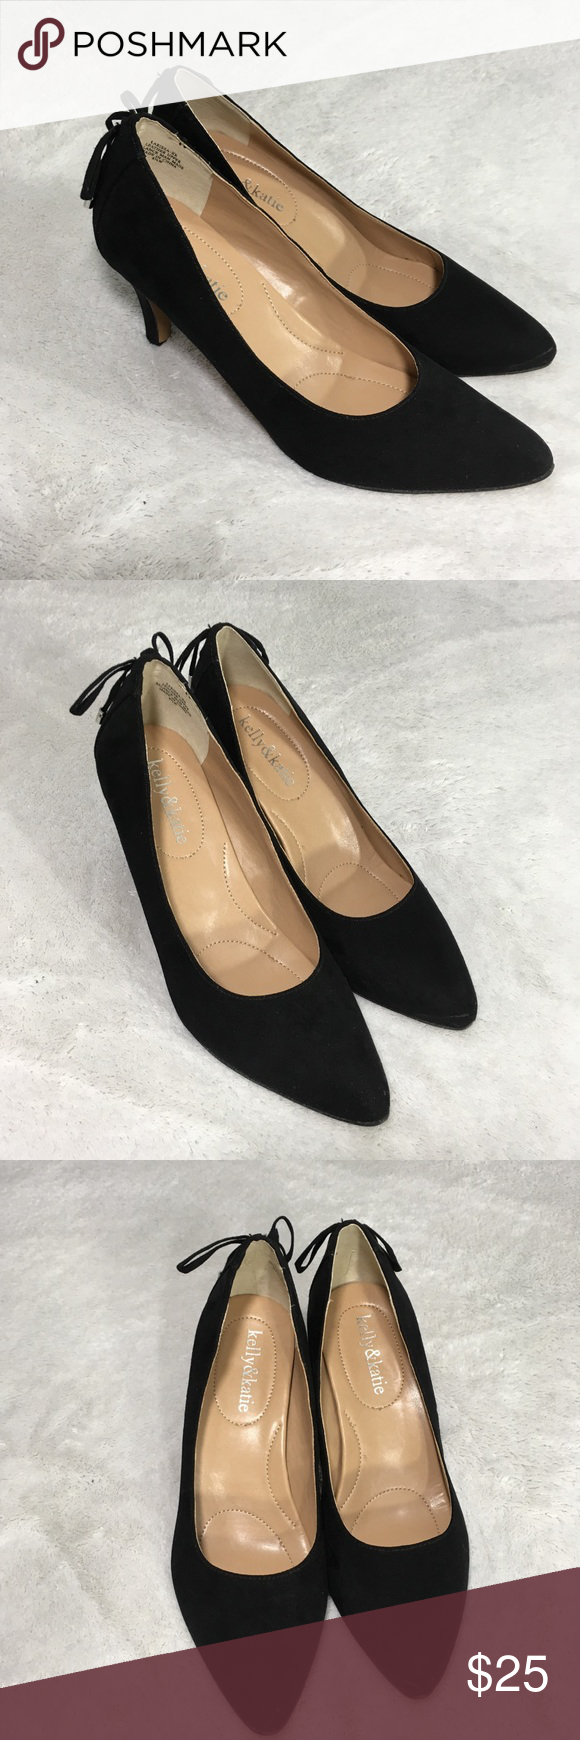 Elegant black heels size 6.5